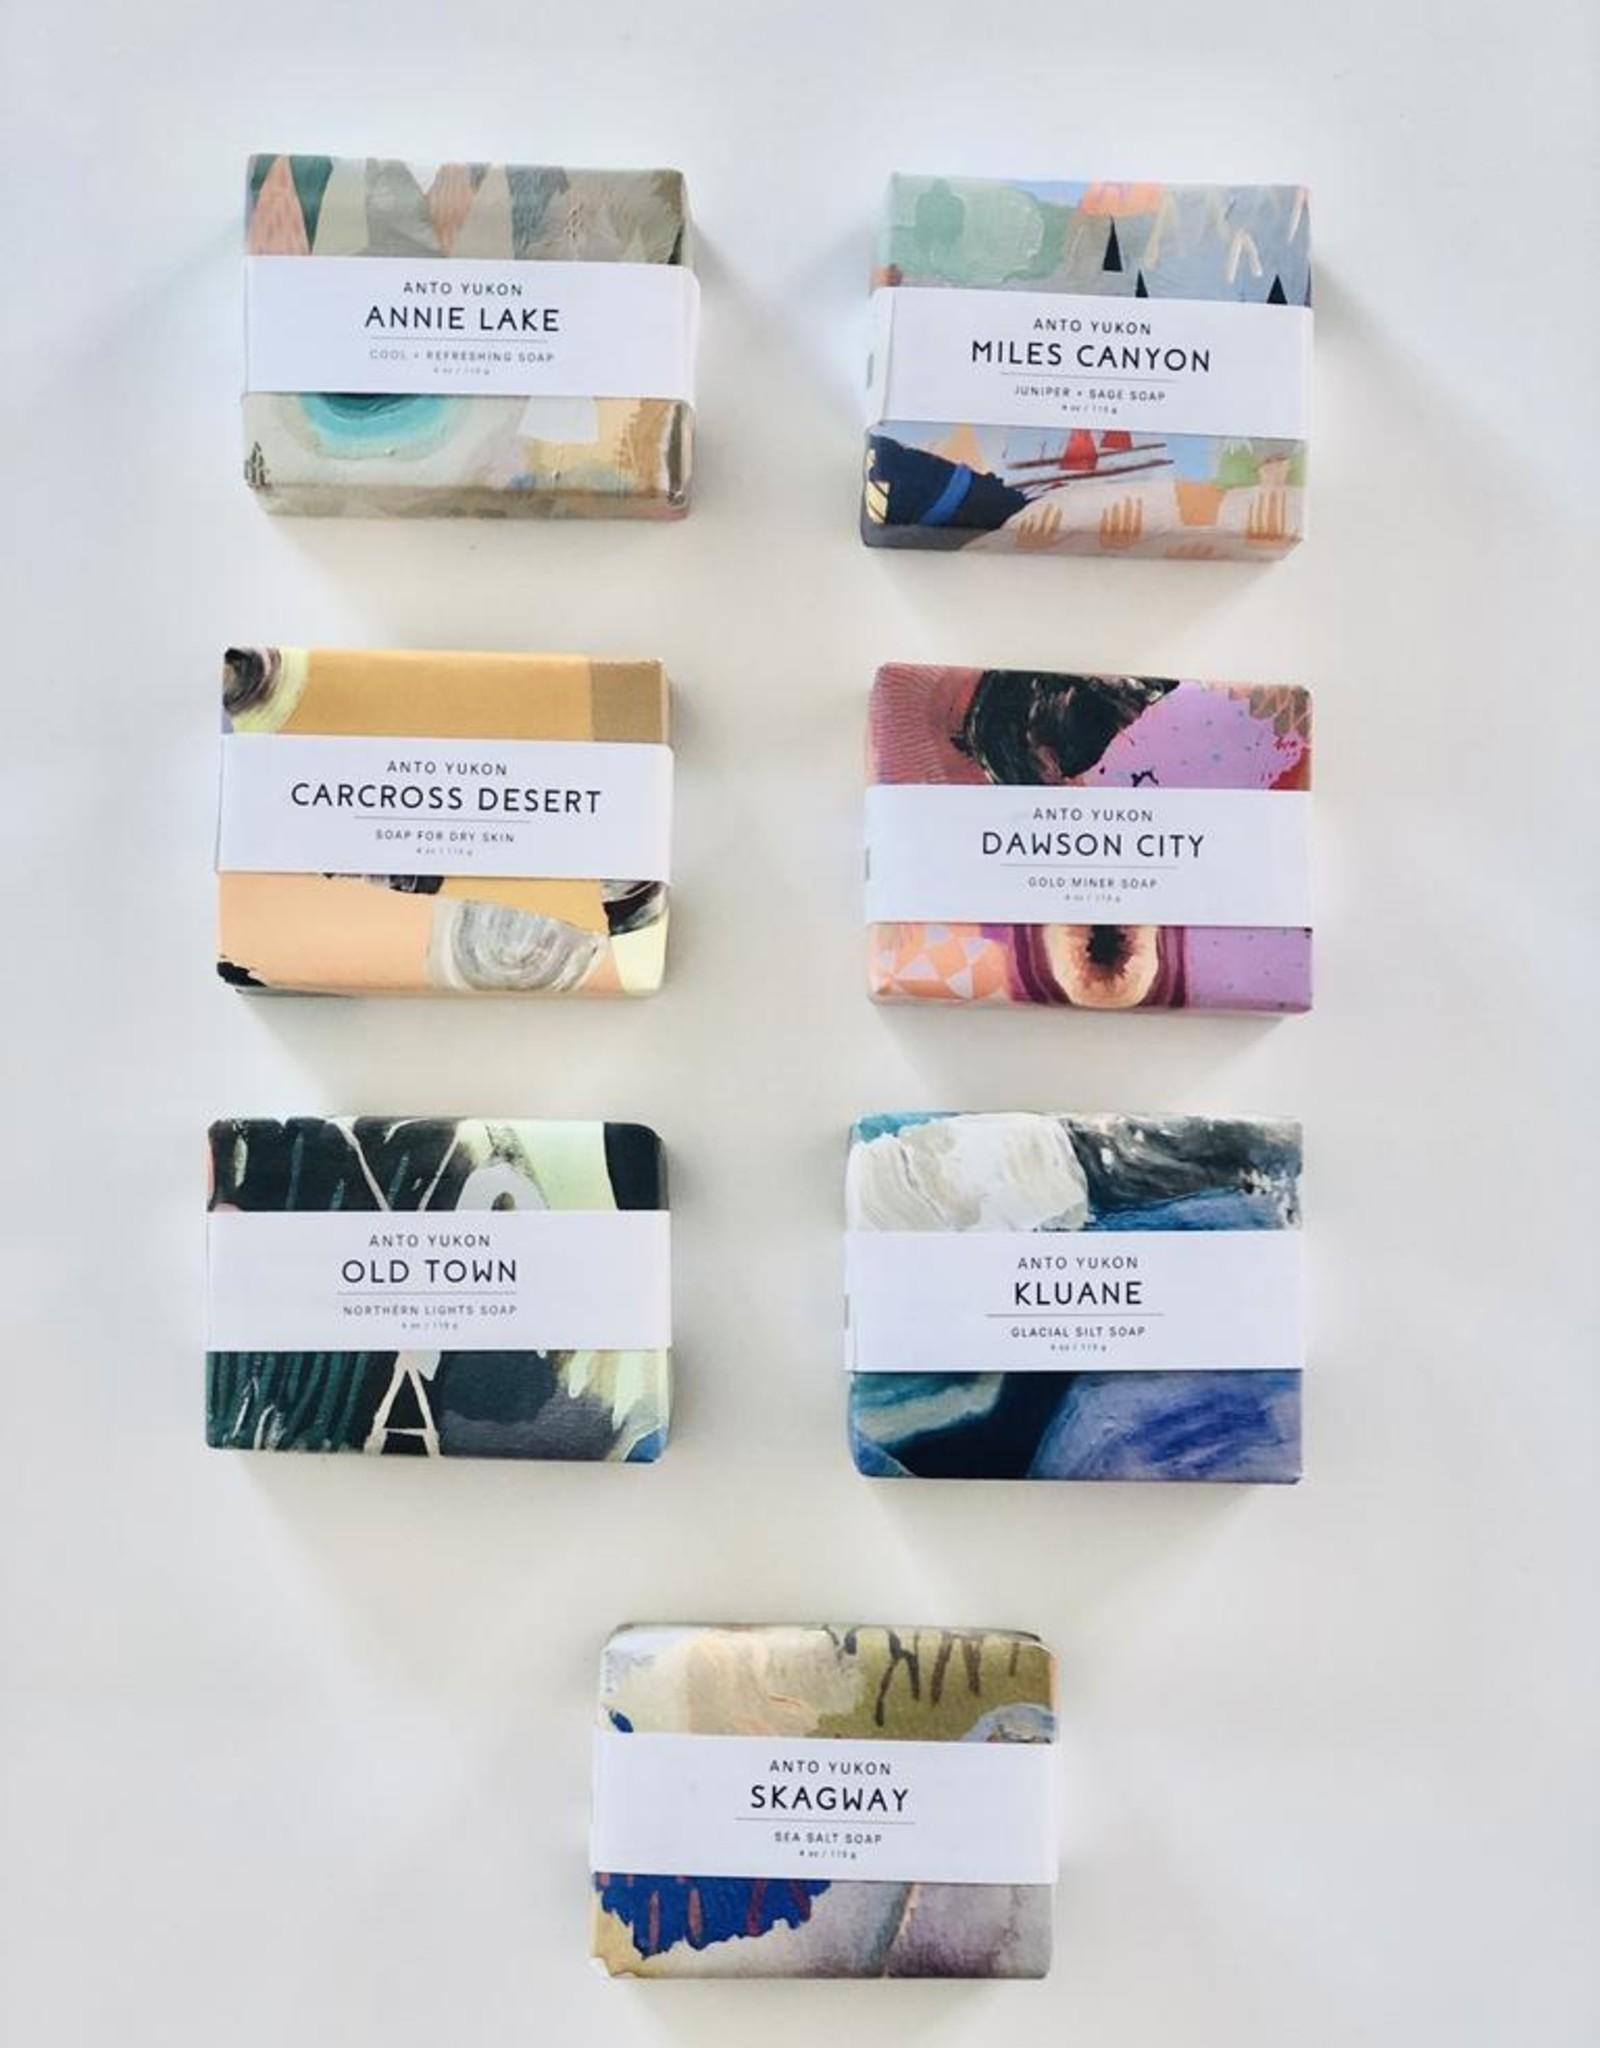 Anto Handmade Soap Skagway